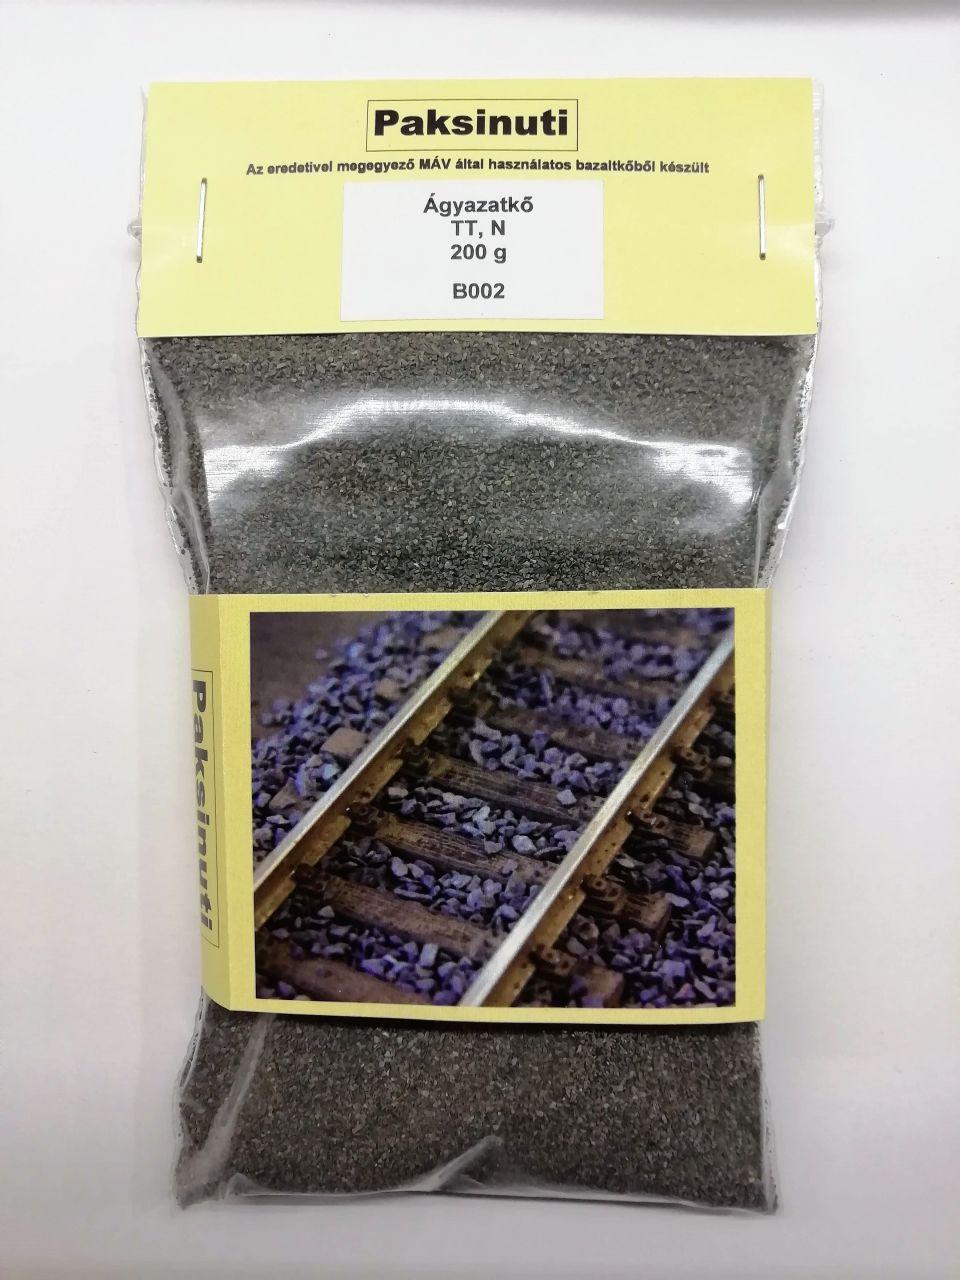 Paksinuti B002 Ágyazatkő, bazaltzúzalék 200g (1:120/160)